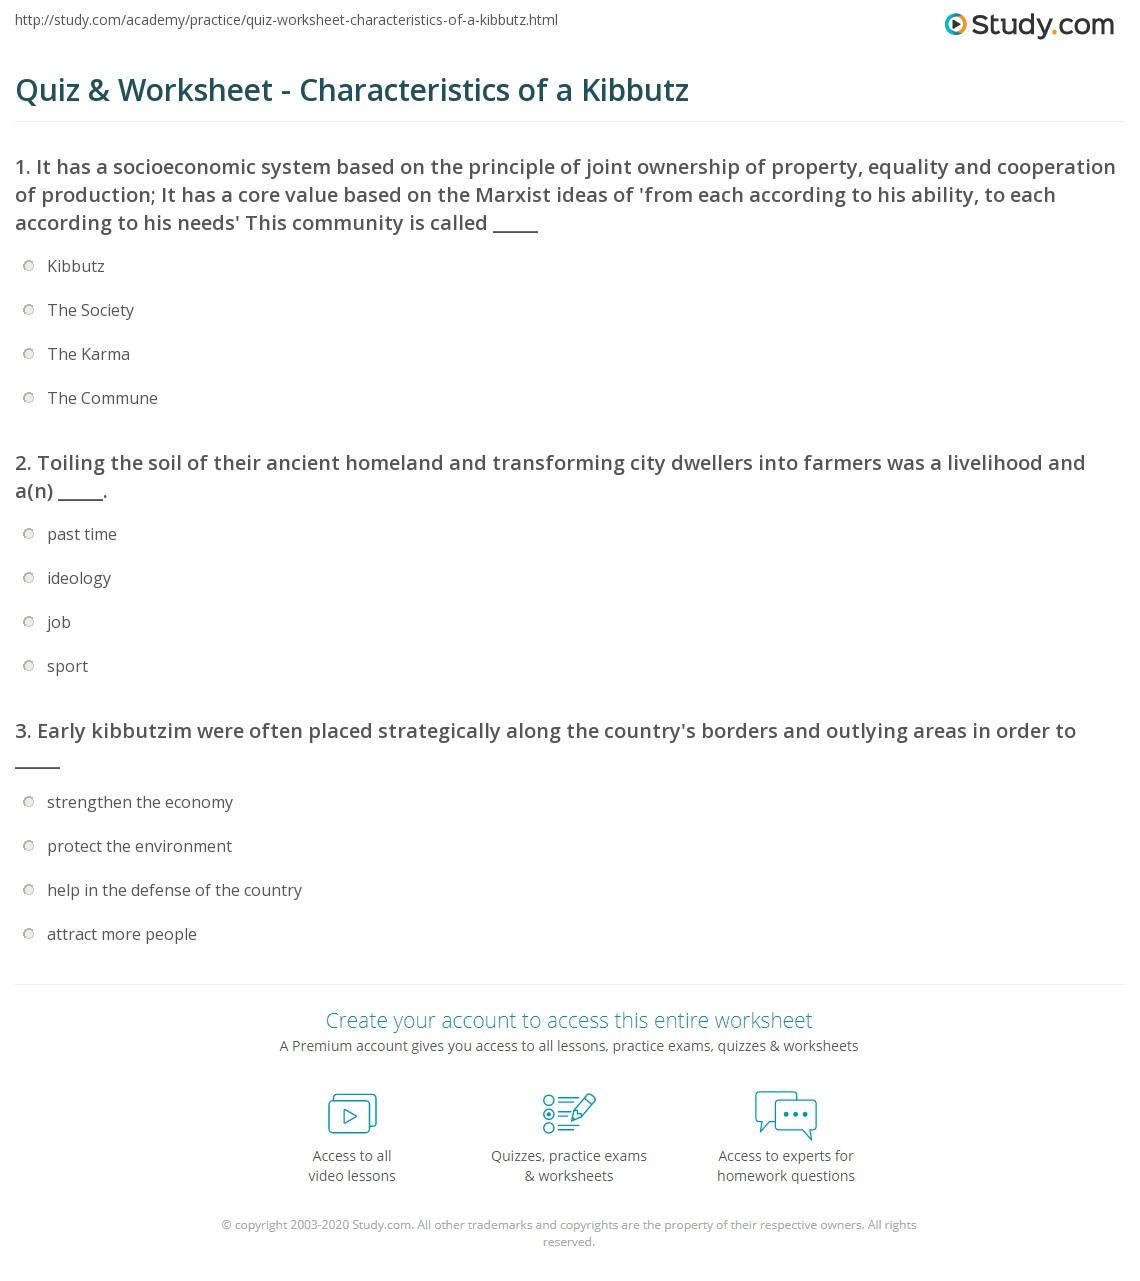 Worksheets Core Values Worksheet quiz worksheet characteristics of a kibbutz study com print definition overview worksheet